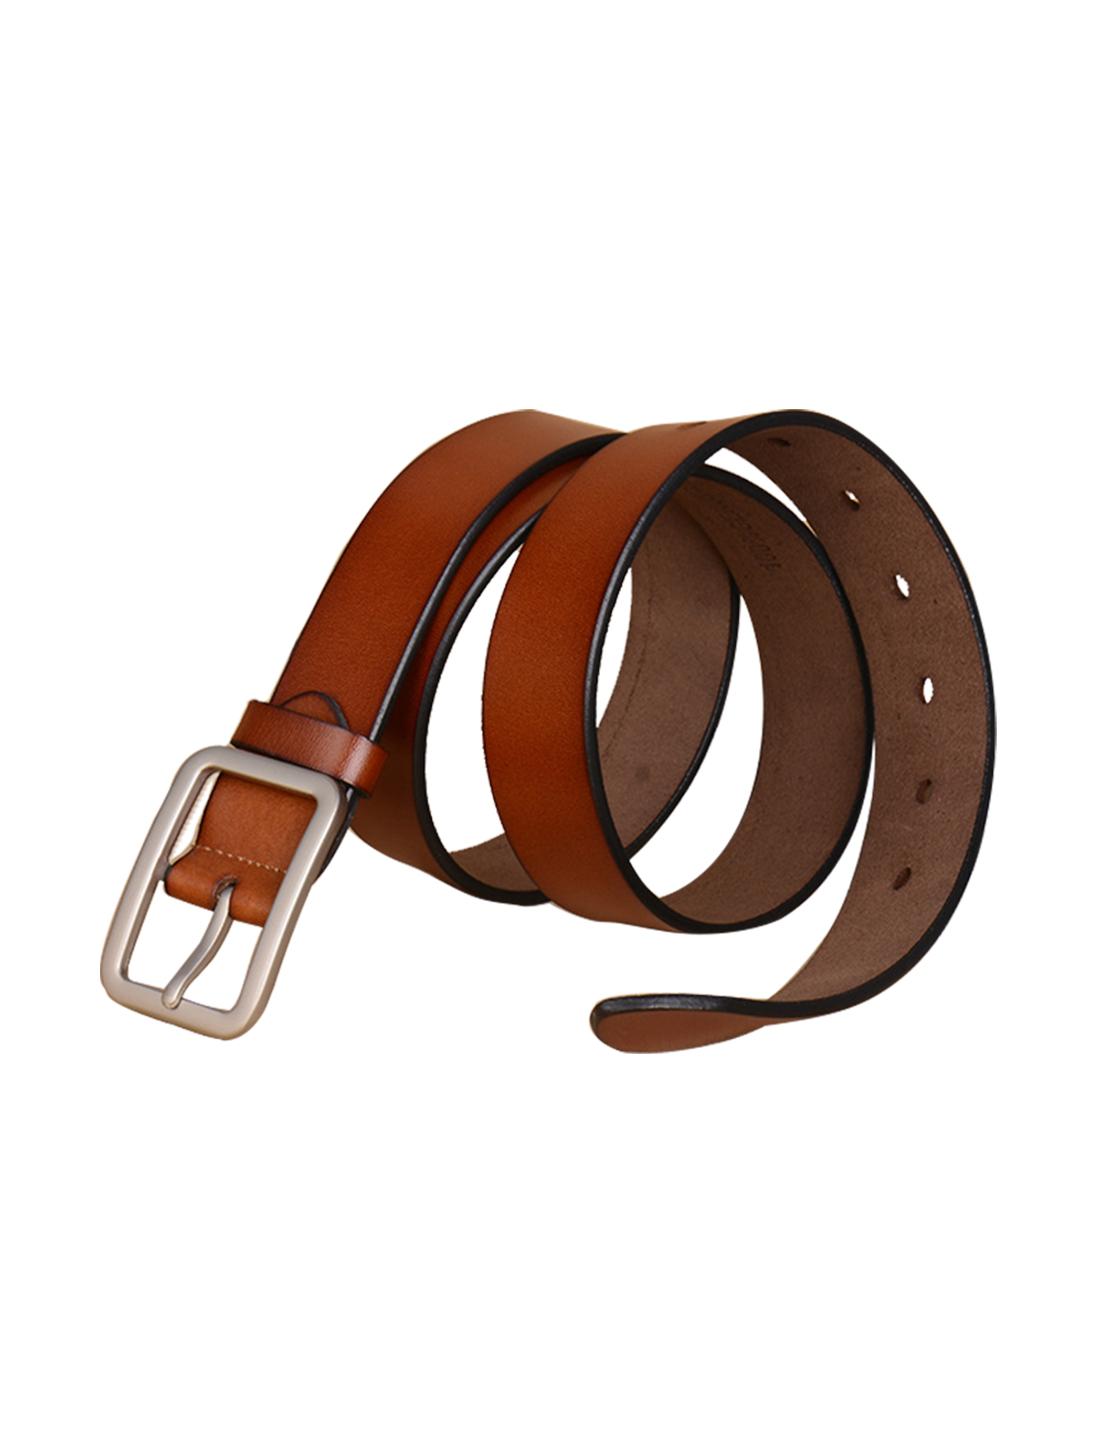 Mens Casual Single Pin Buckle Dress Leather Belt 33mm Width 1 1/4 Brown 125cm